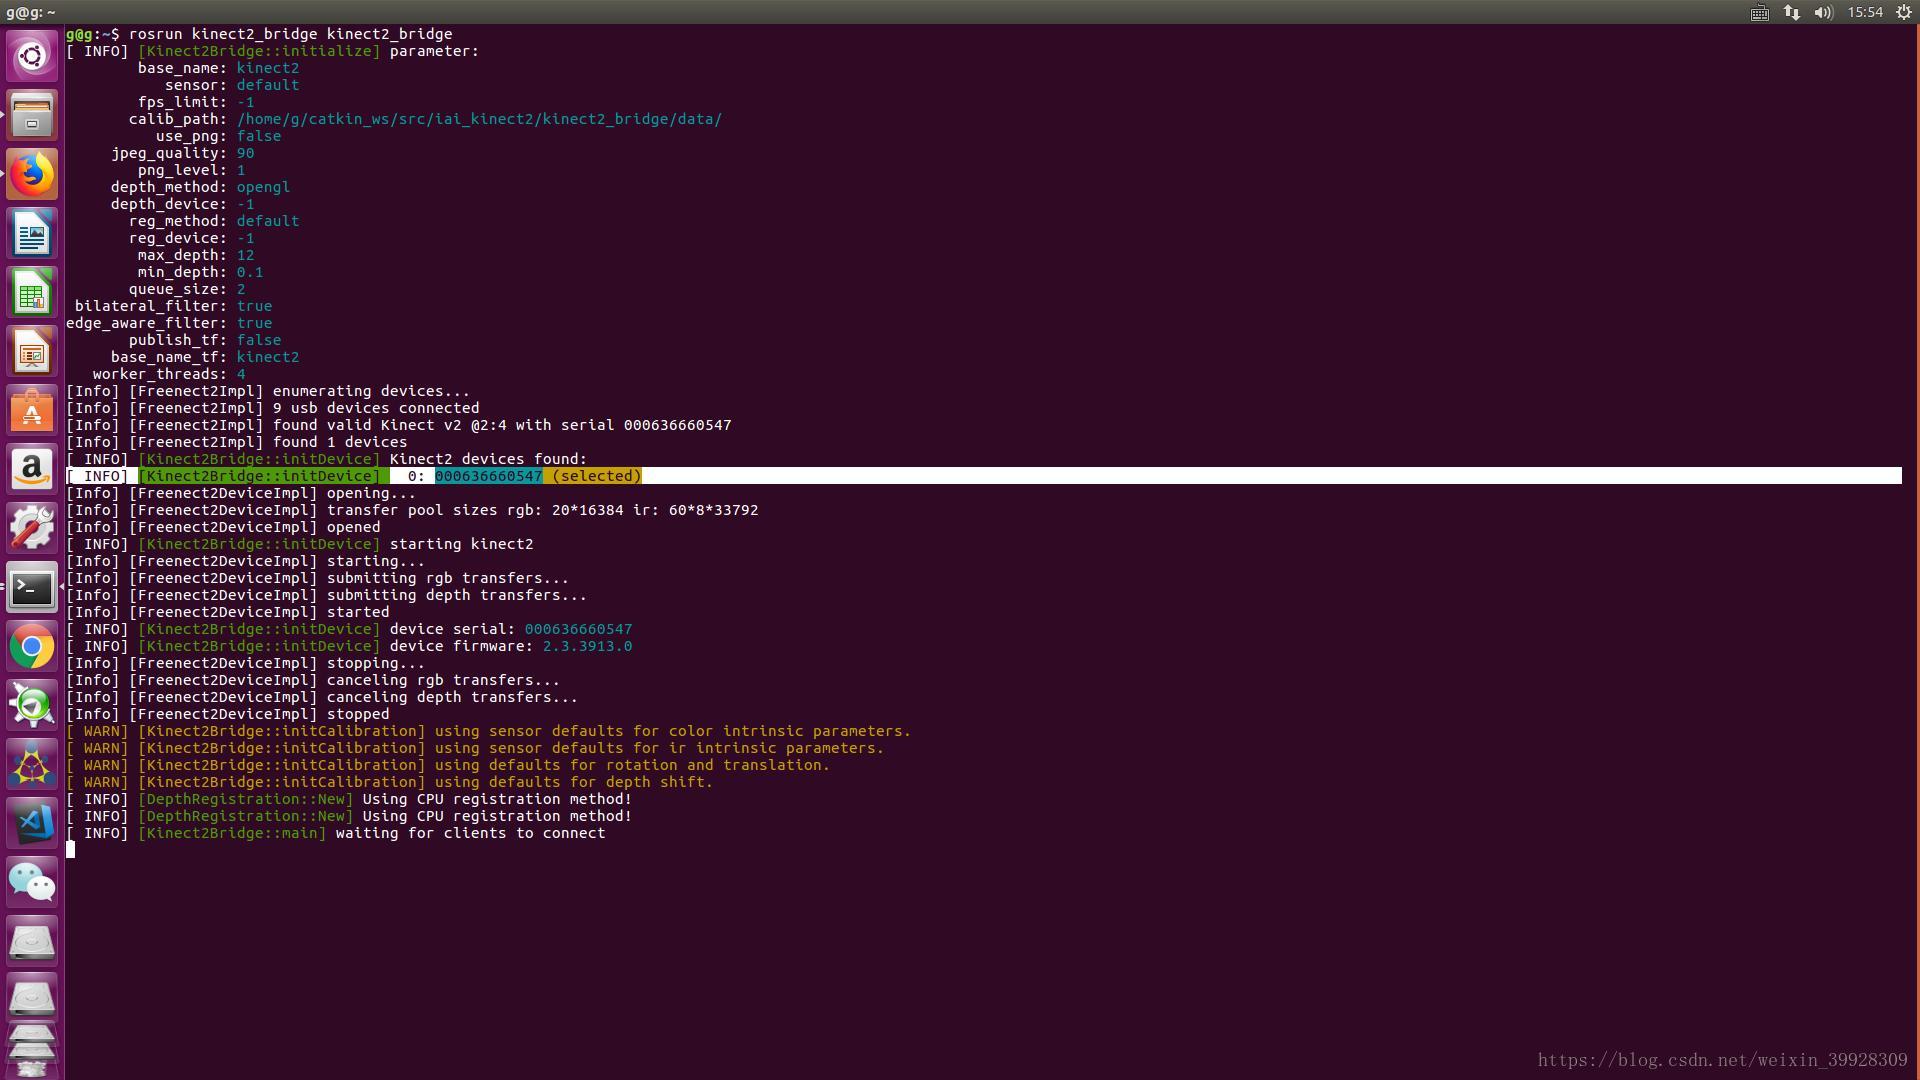 Ubuntu kinect v2 camera calibration - Programmer Sought